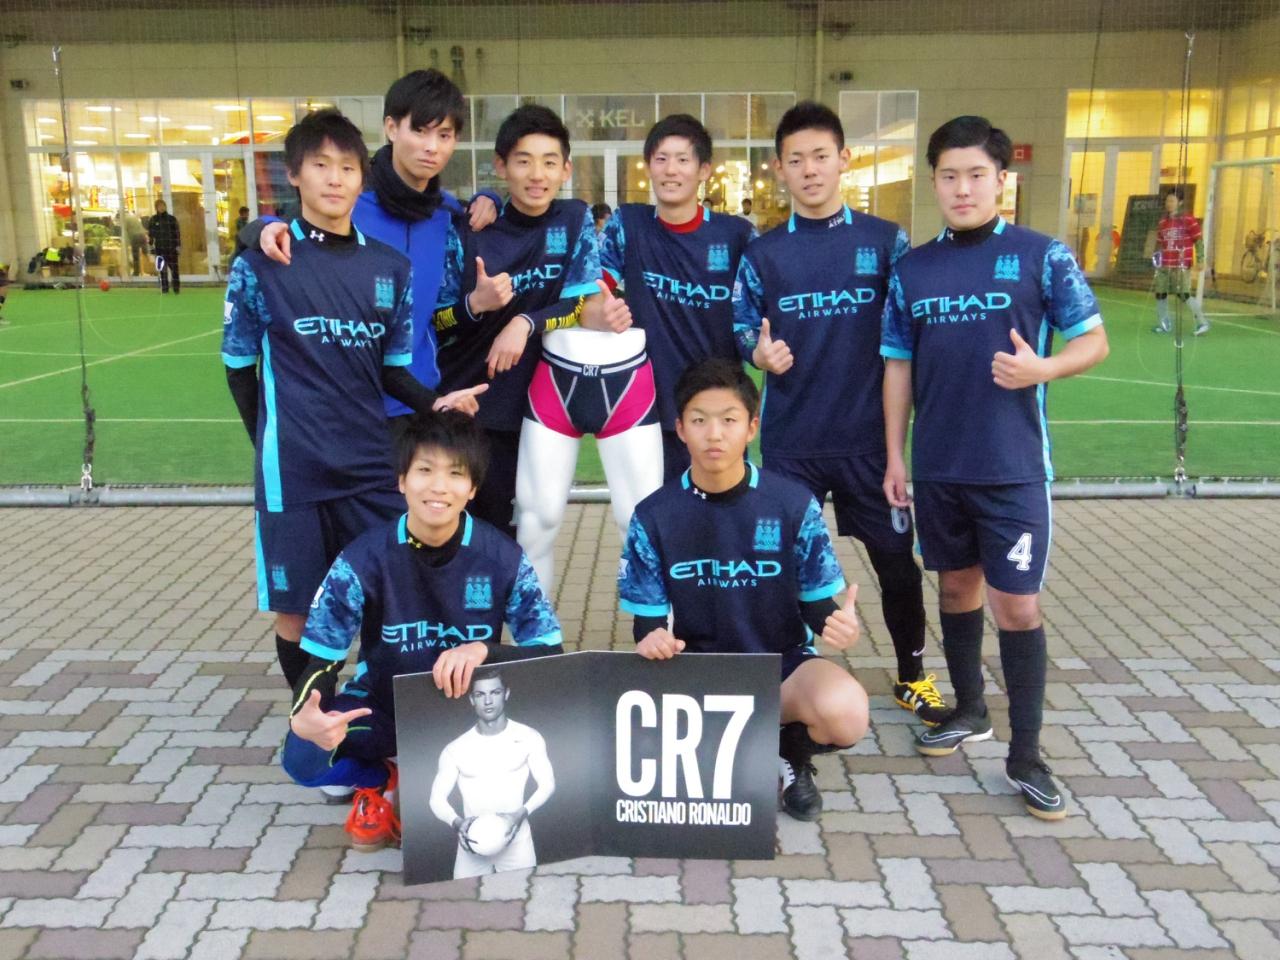 CR7TG